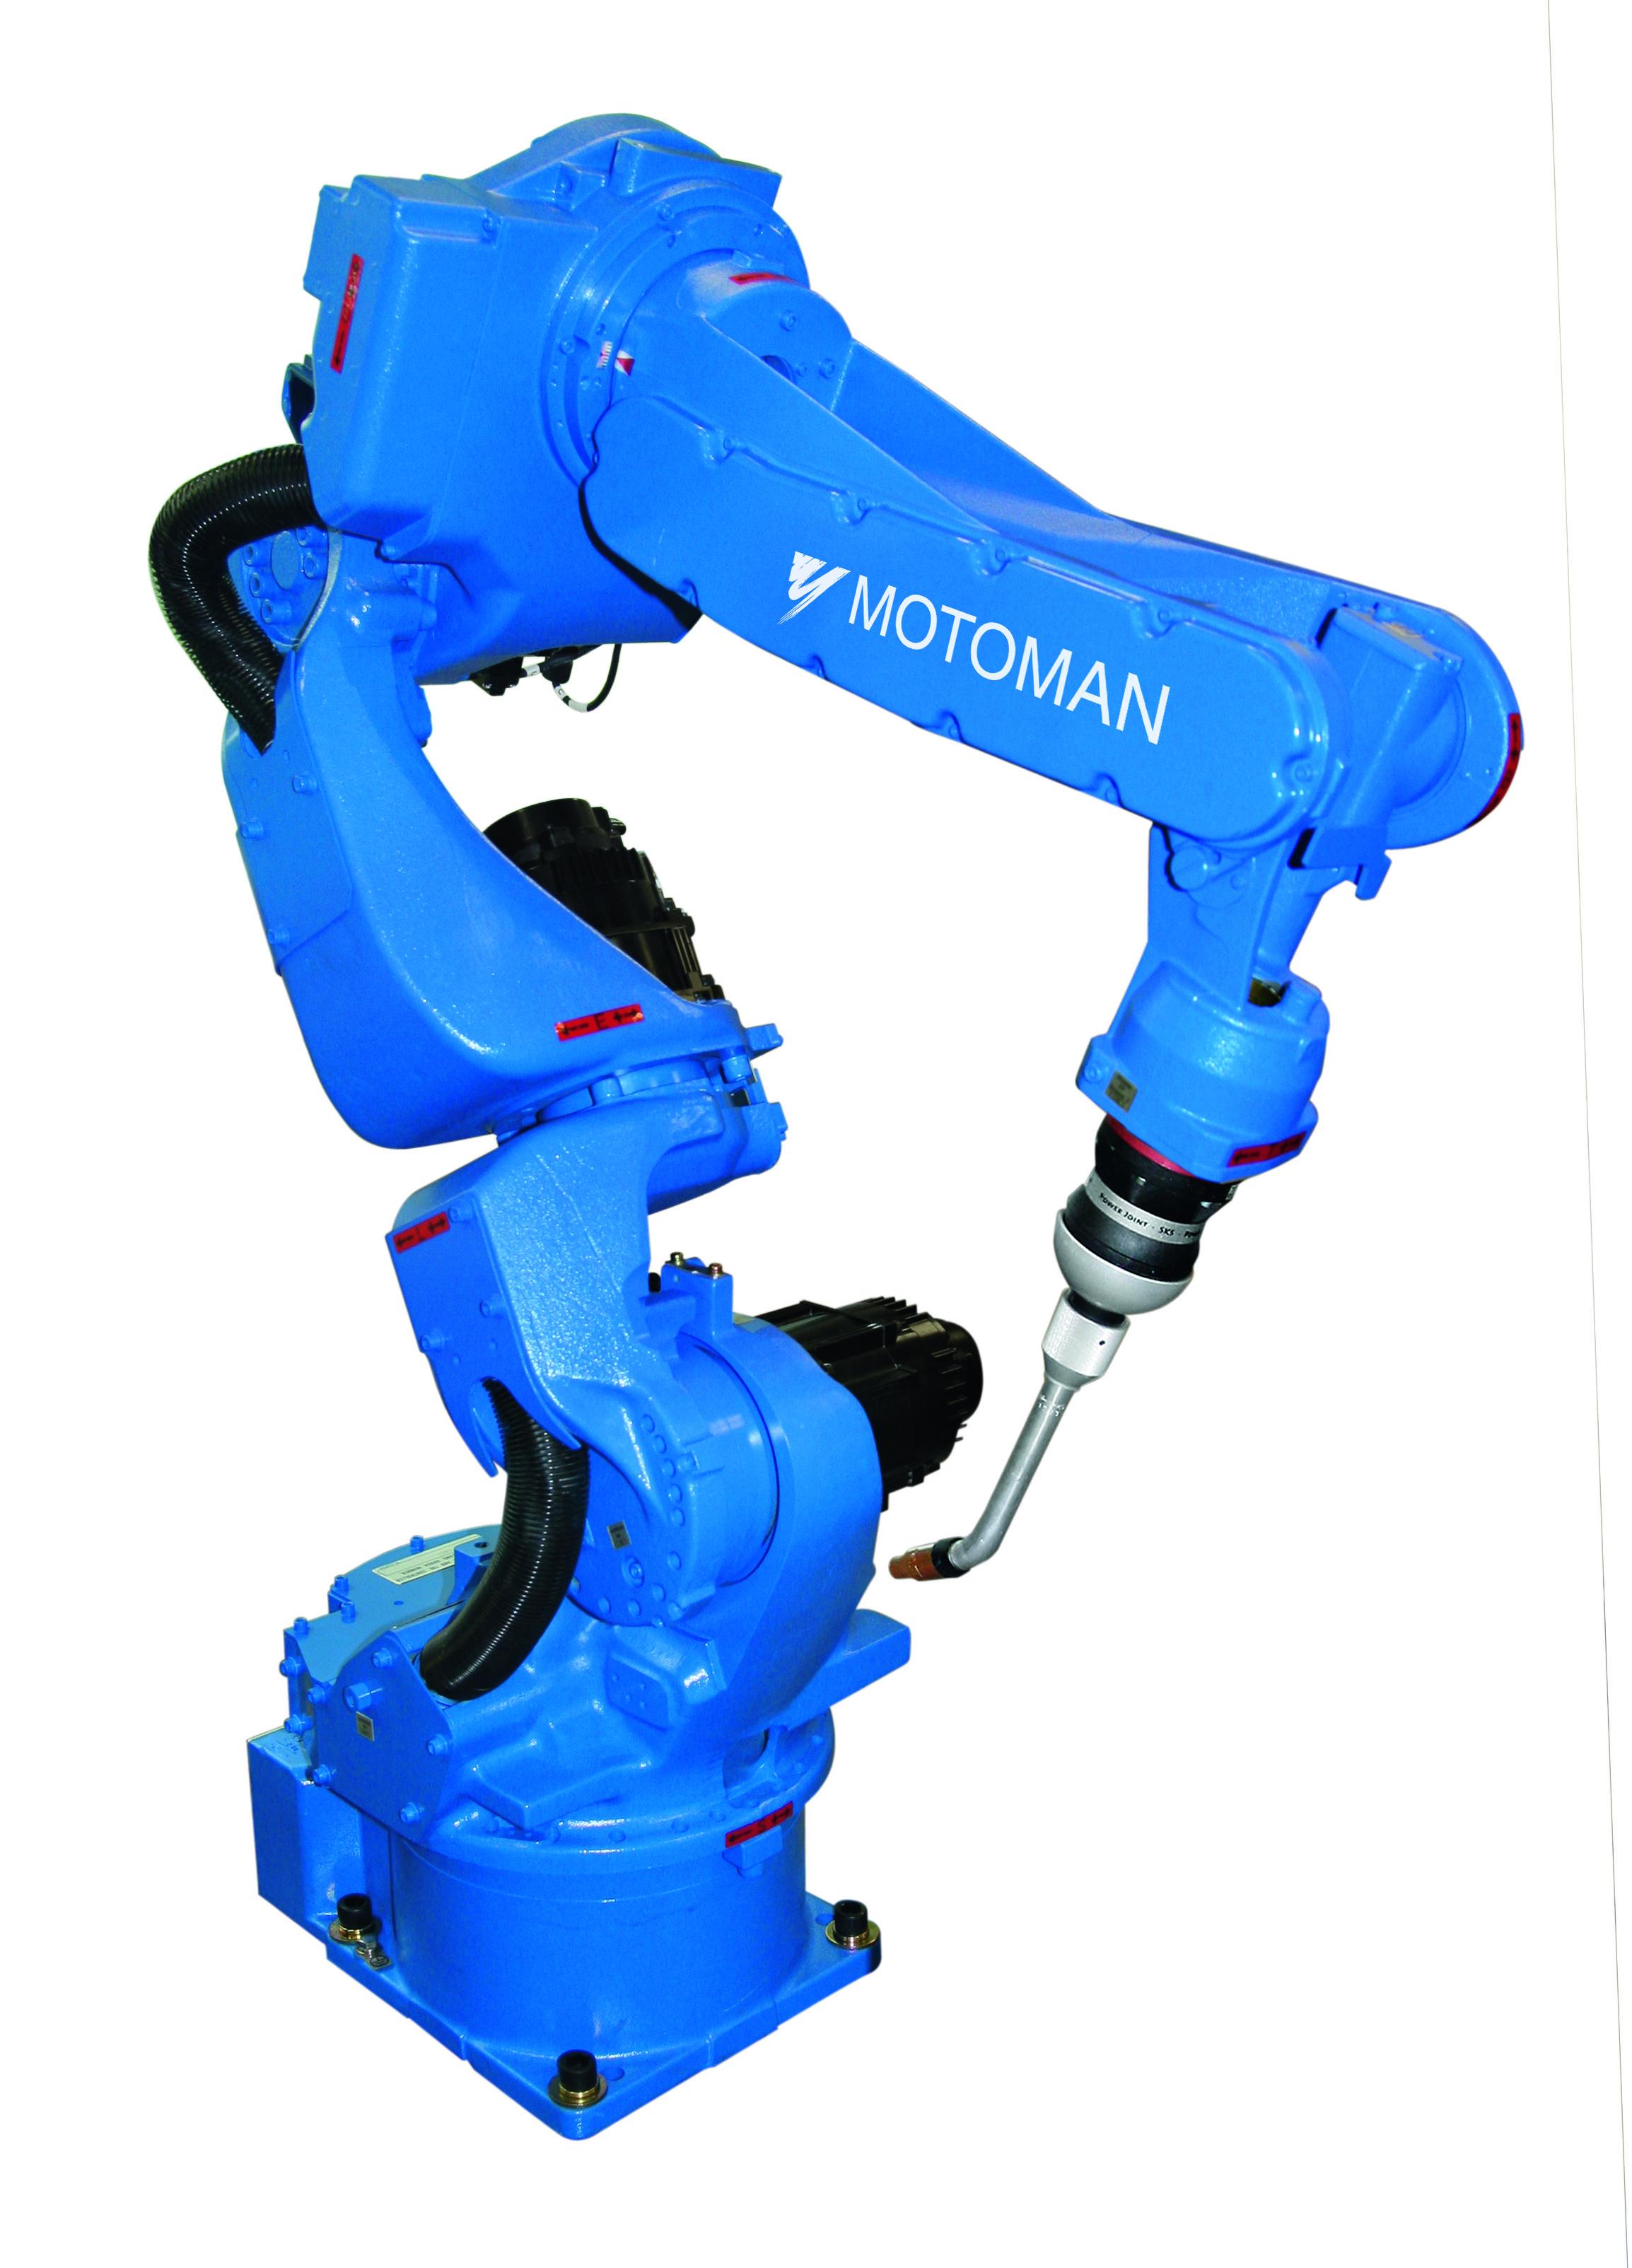 Industrial Robot Yaskawa Motoman VA1400 with 7 axis | Technology